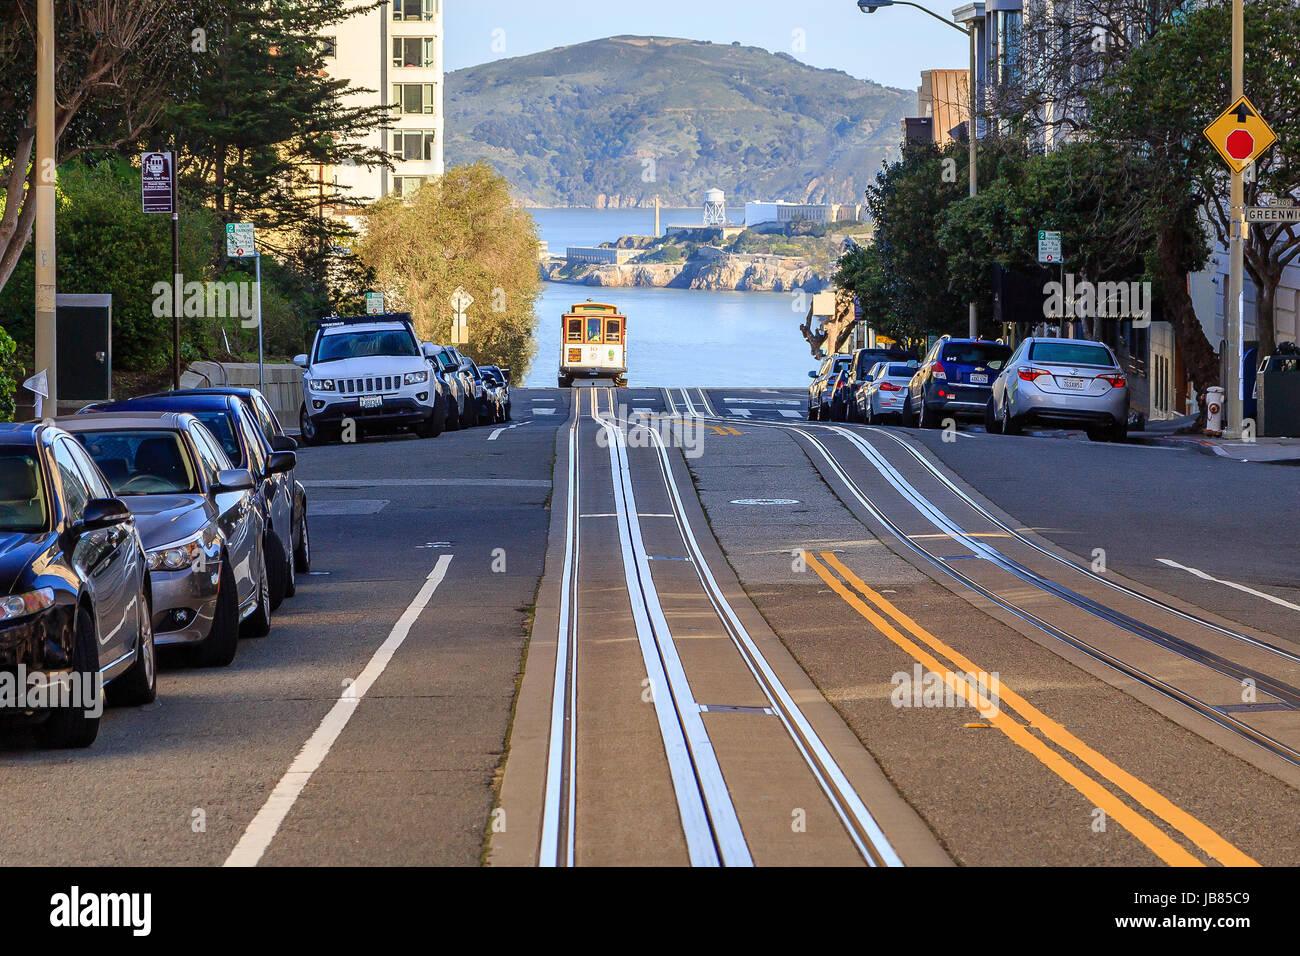 Un teleférico de llegar a la cima de una colina en San Francisco. Imagen De Stock